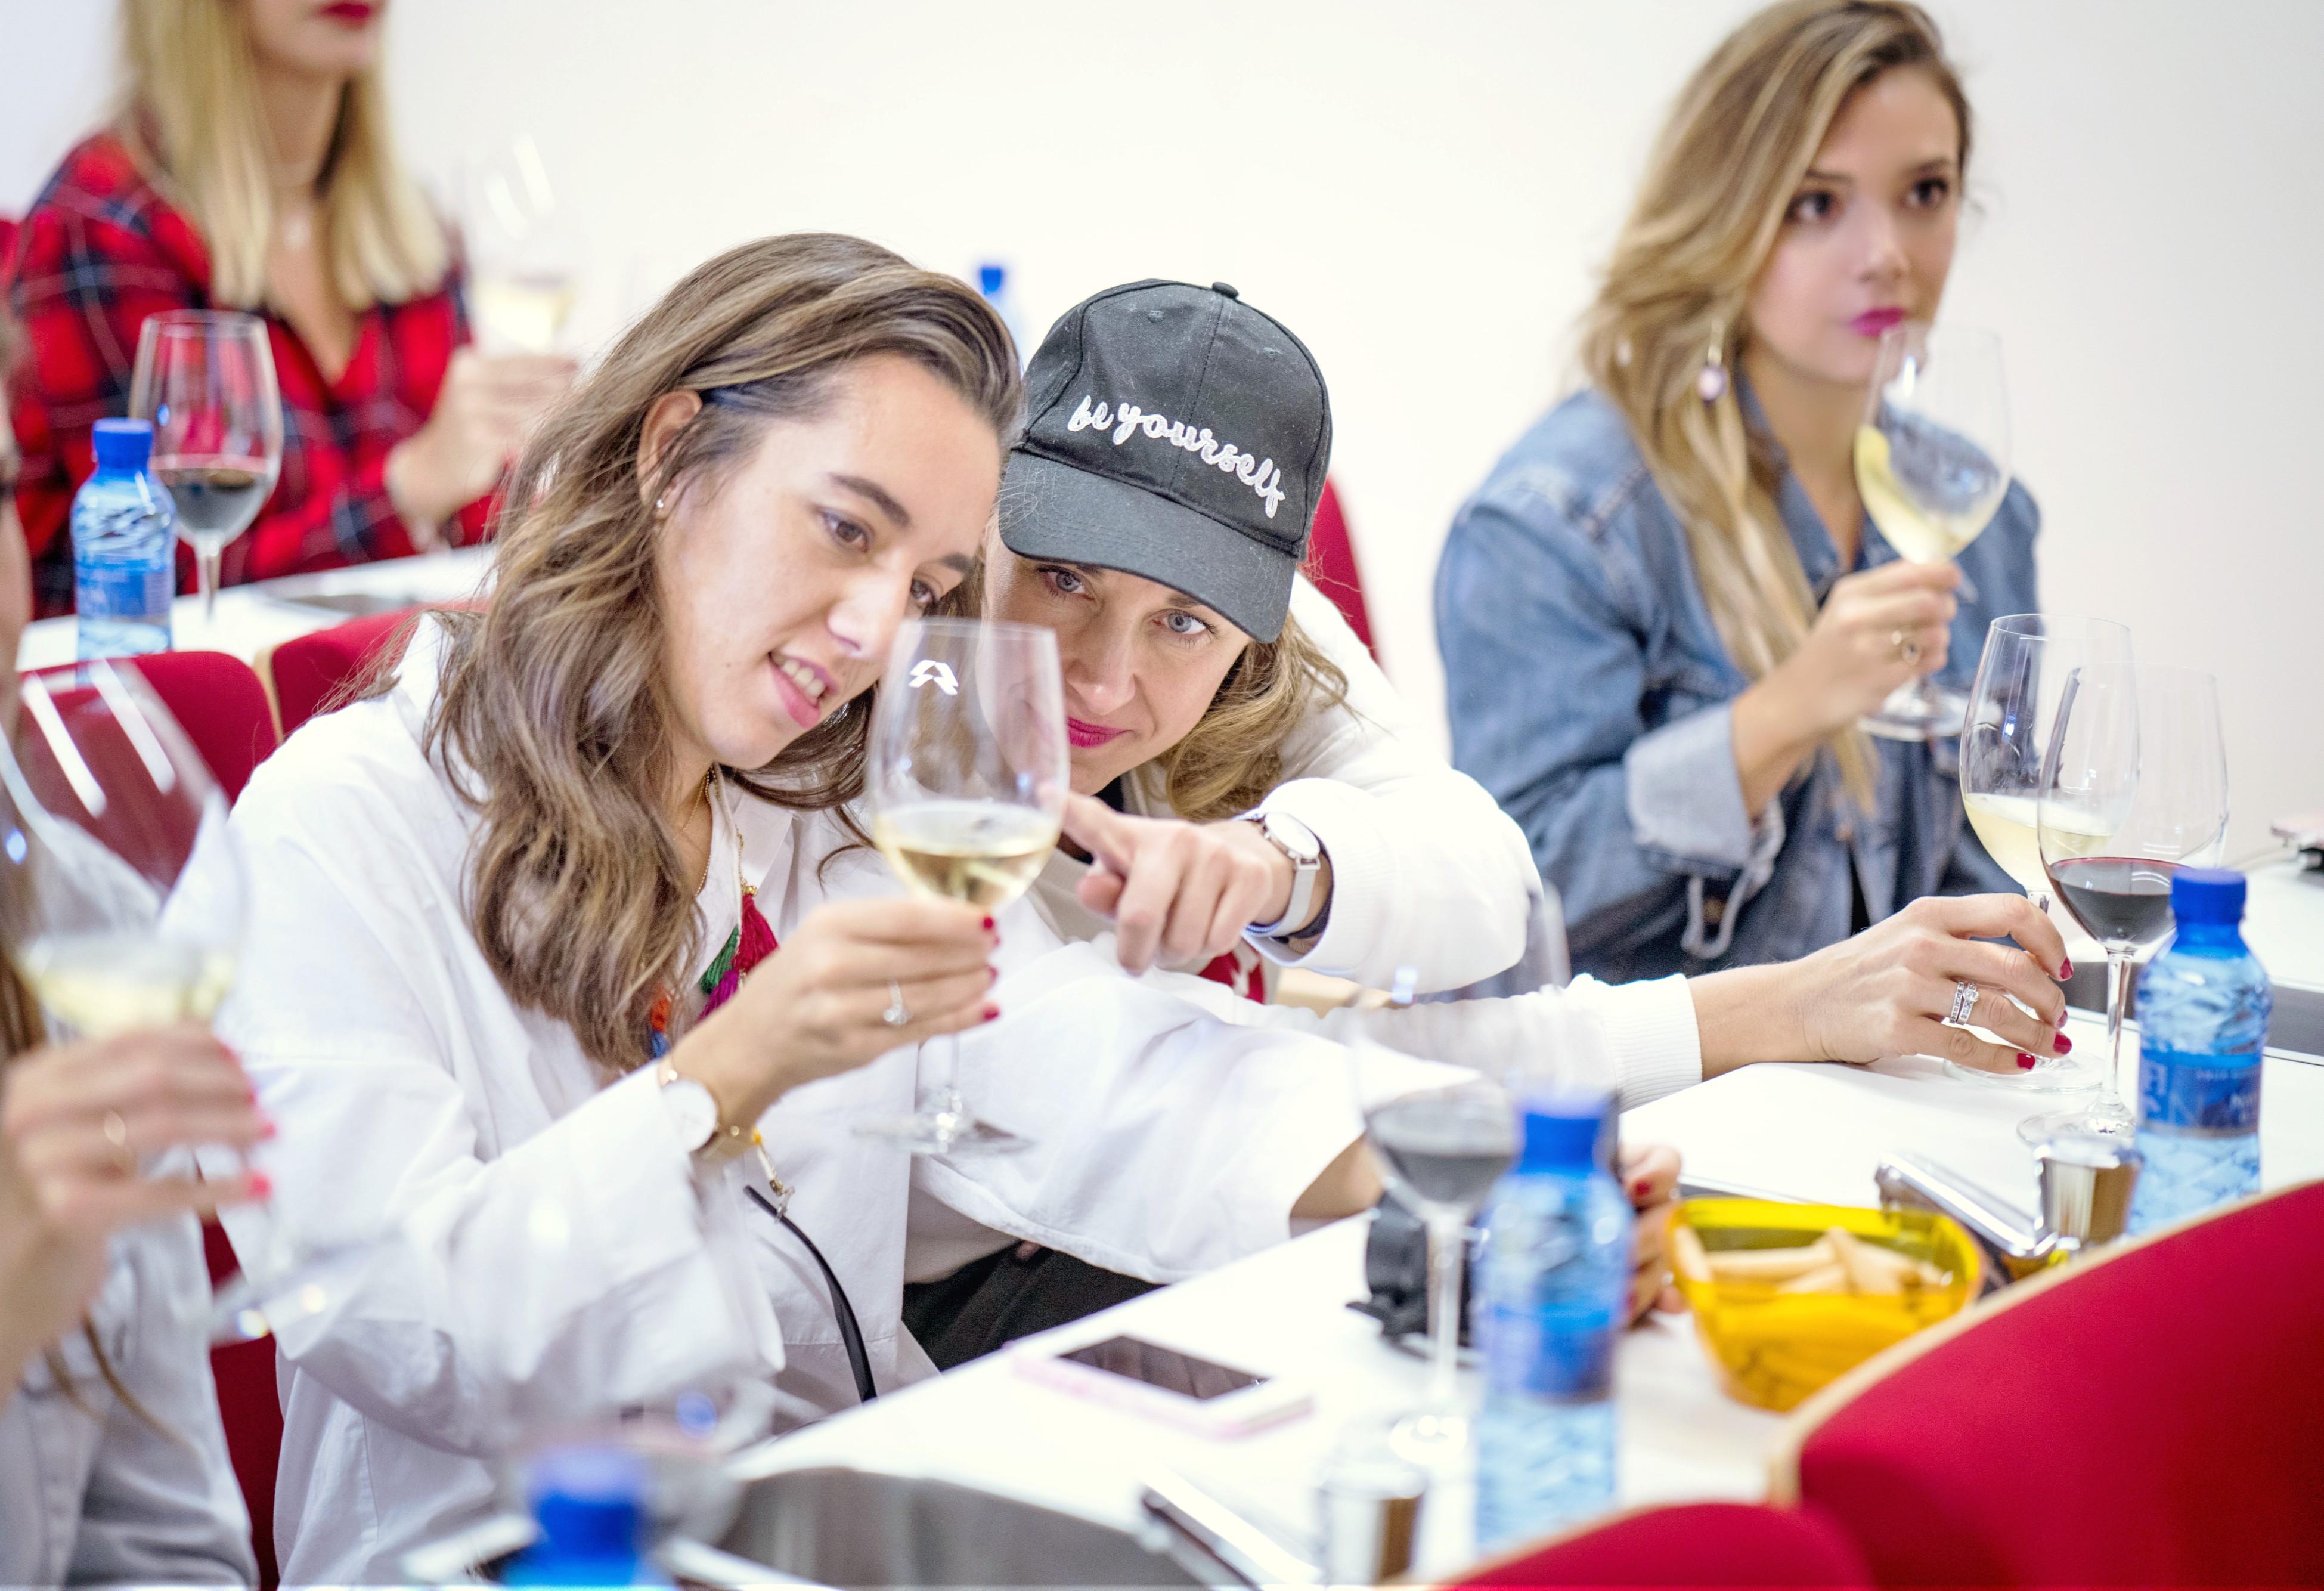 Cosmeticata-Vendimia-Chic-Esdor-Blog-de-moda-ChicAdicta-fashionista-Chic-Adicta-influencer-madrid-belleza-blogger-PiensaenChic-Piensa-en-Chic